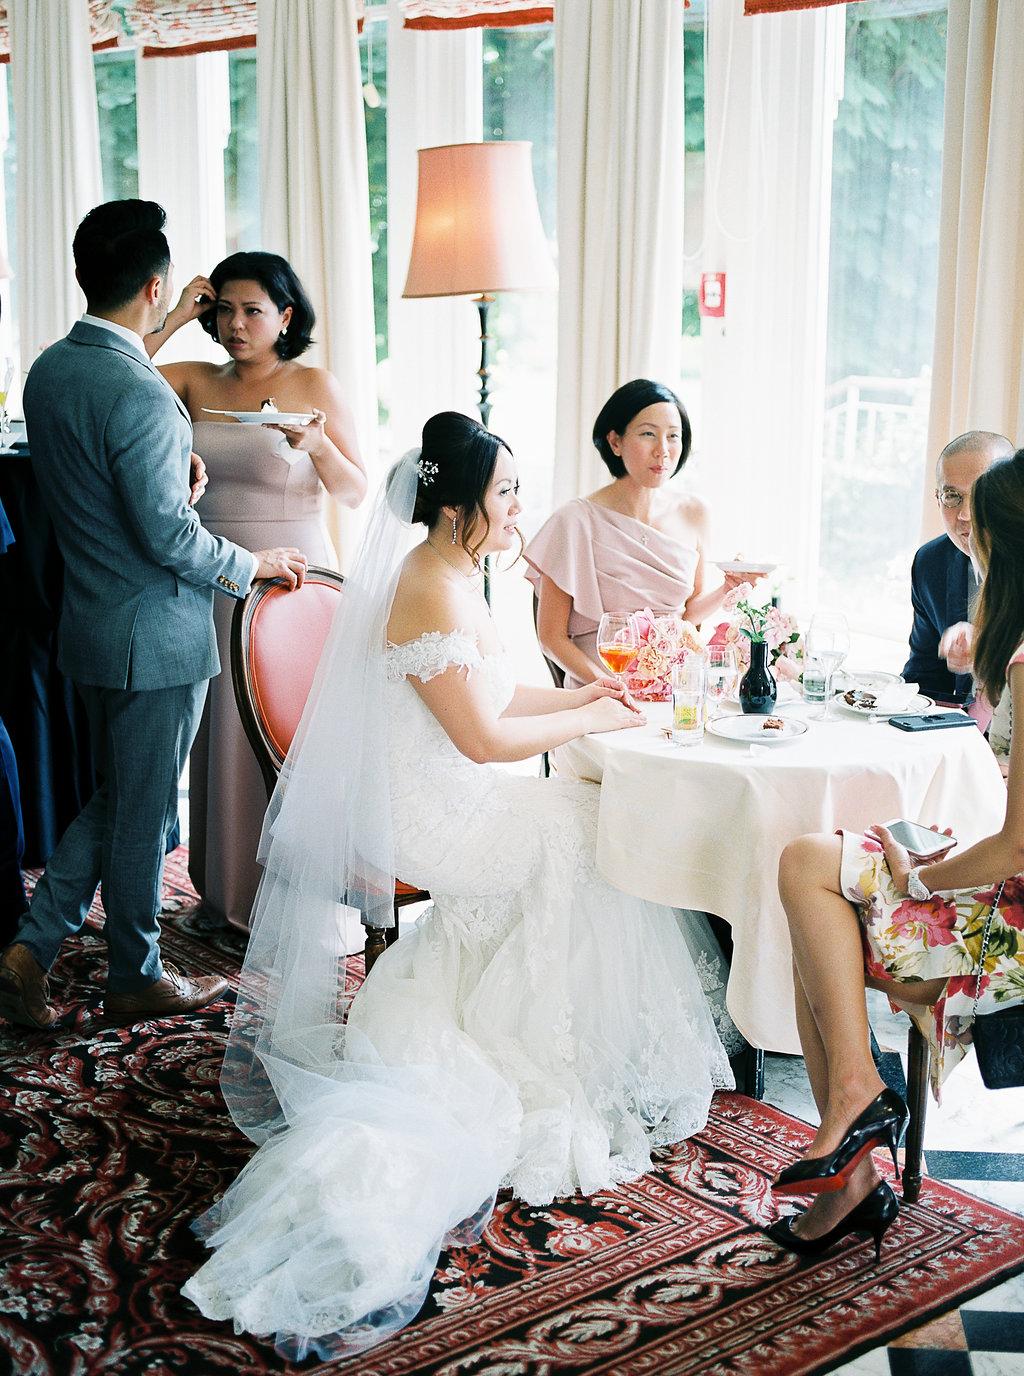 Luxe Navy and Pink Wedding at Schloss Fuschl in Austria by Tanja Kibogo8.JPG